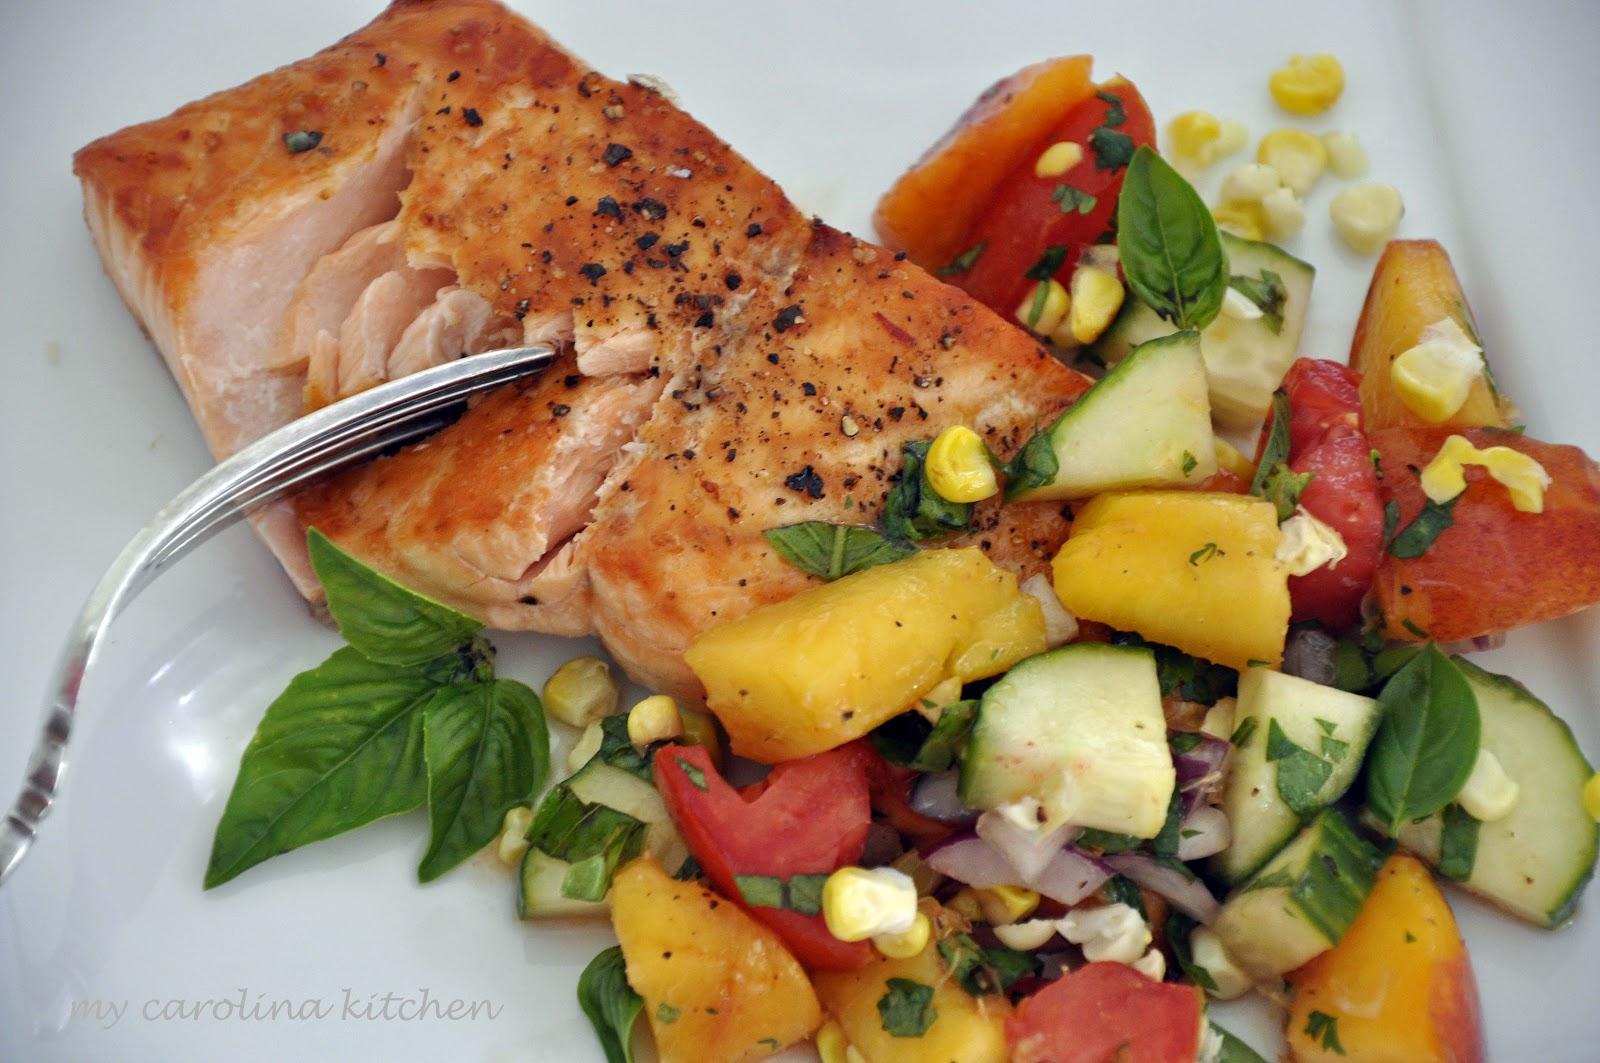 20170420bakedsalmonharissalimeaiolivickywasik Broiled Salmon Preparation:  How To Broil Salmon + A Peach Salsa